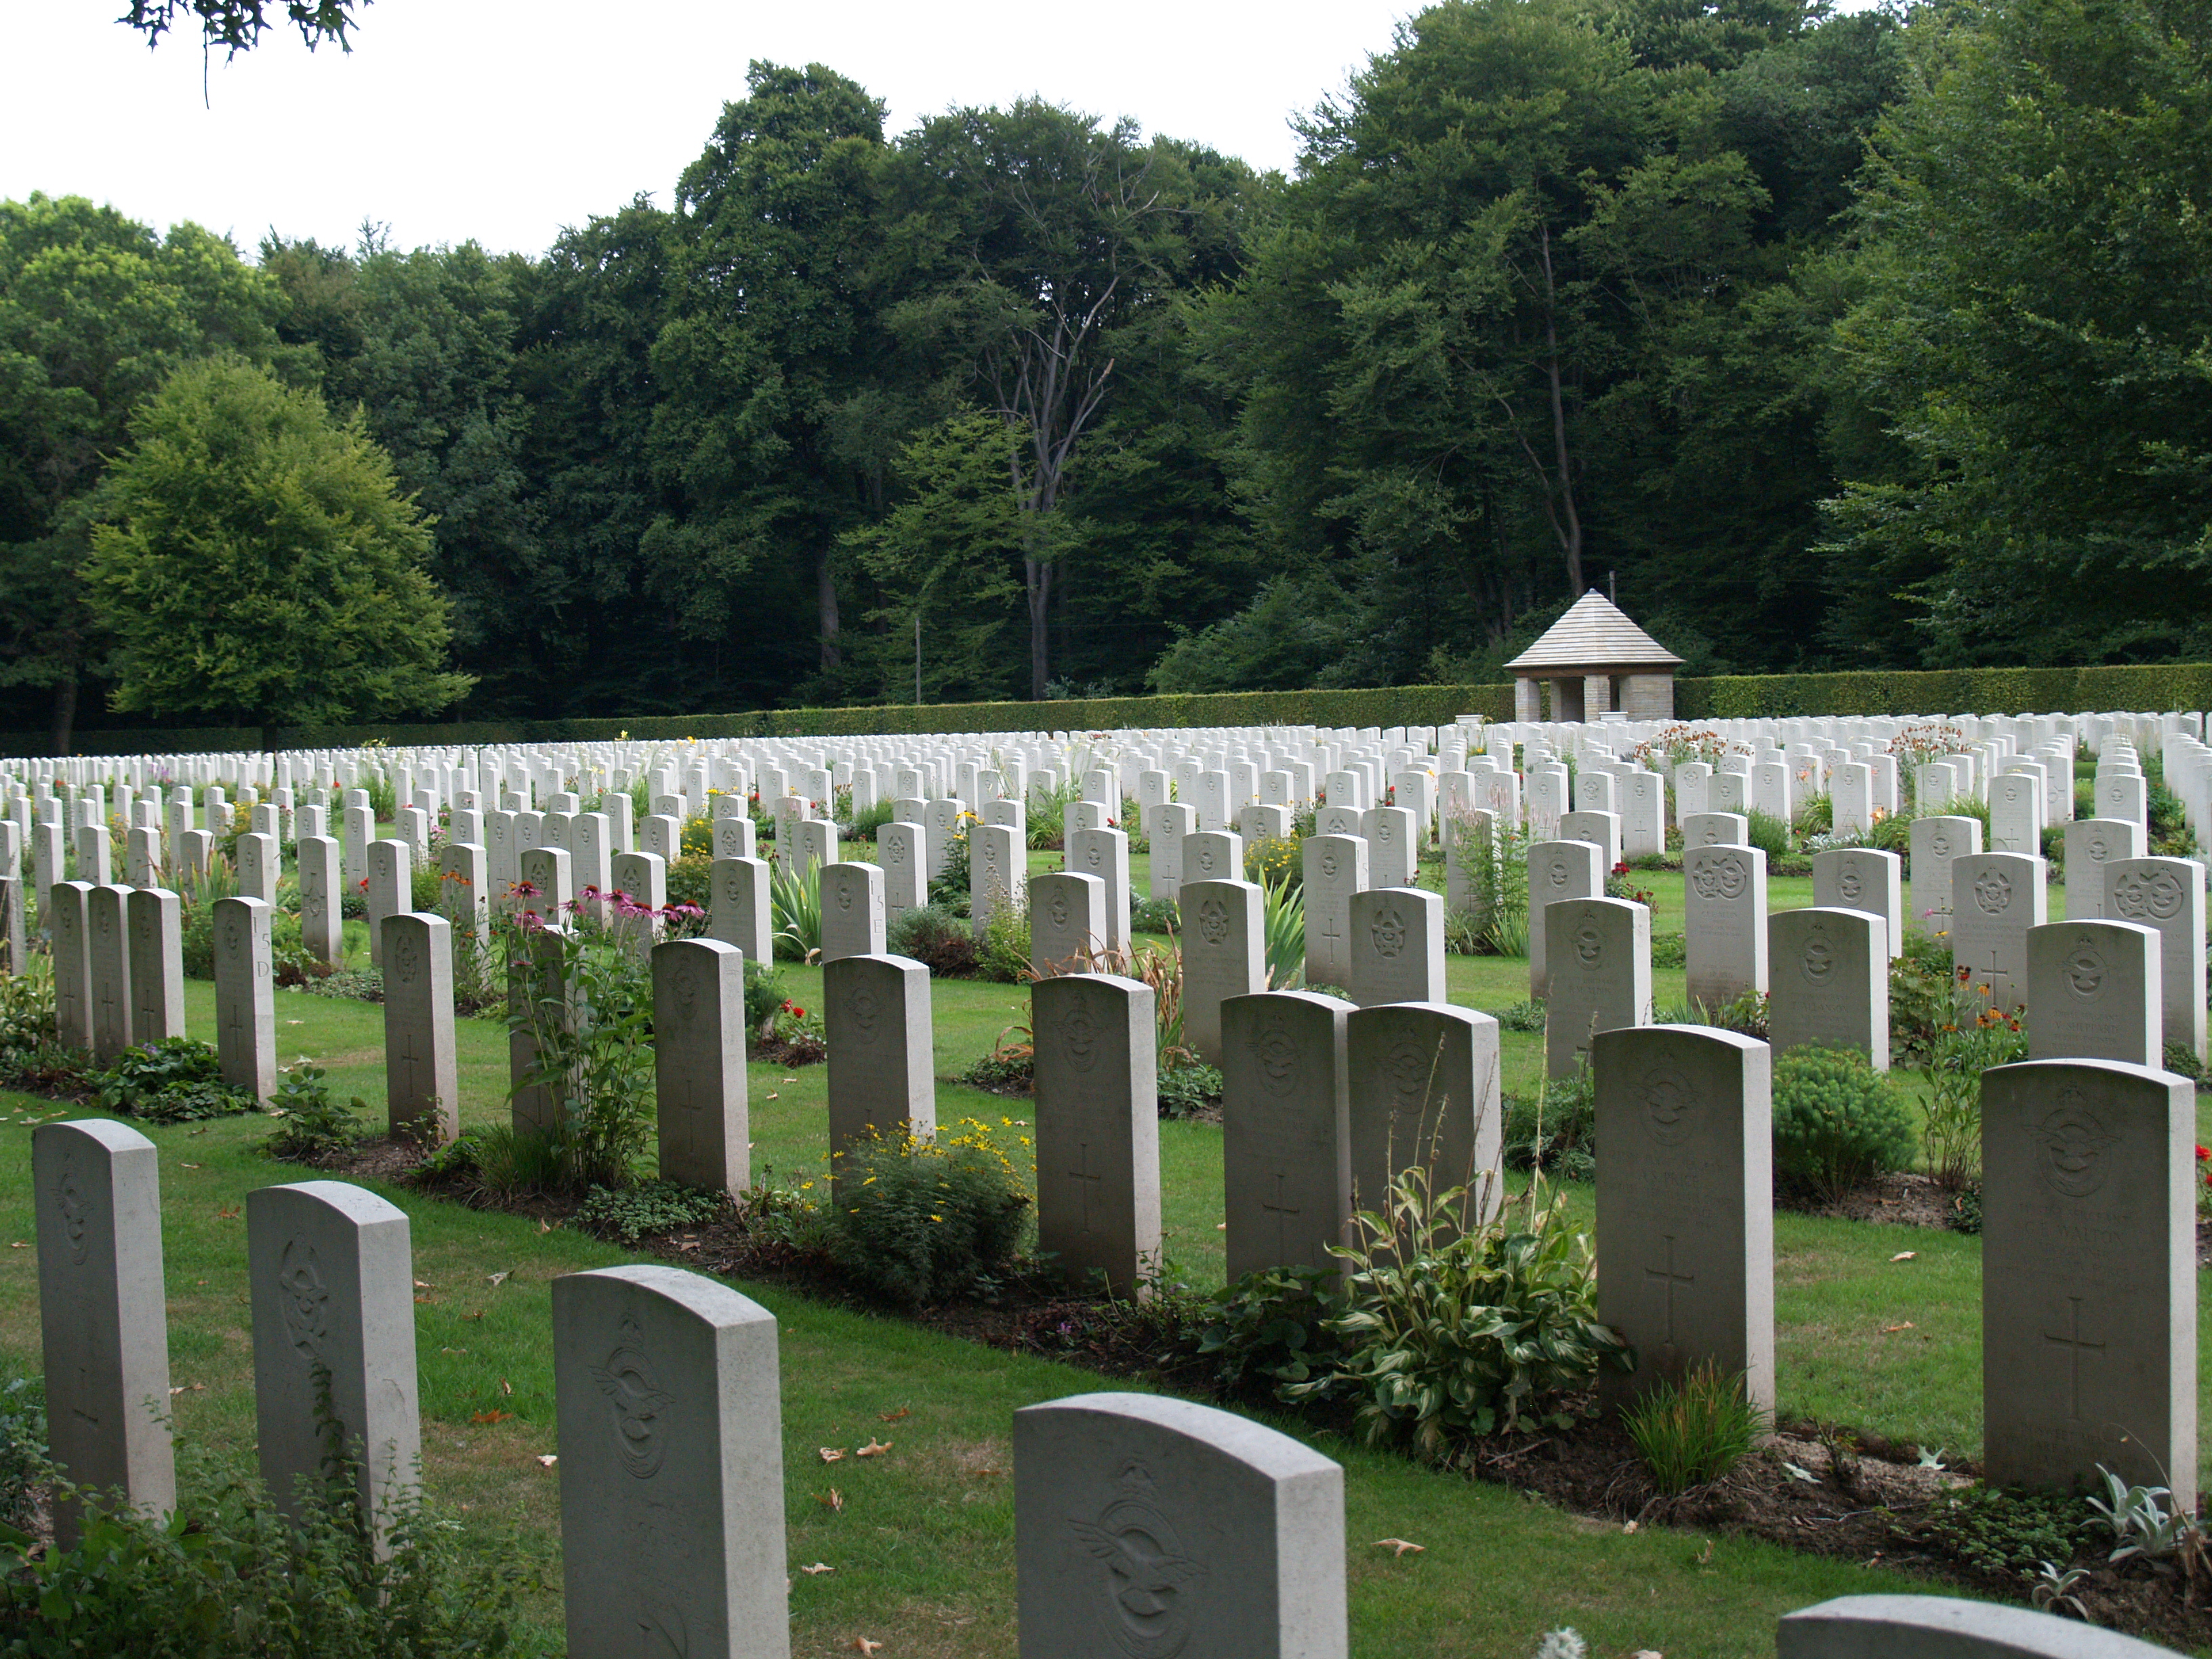 https://upload.wikimedia.org/wikipedia/commons/0/07/Reichswald_Forest_War_Cemetery_%2824%29.JPG